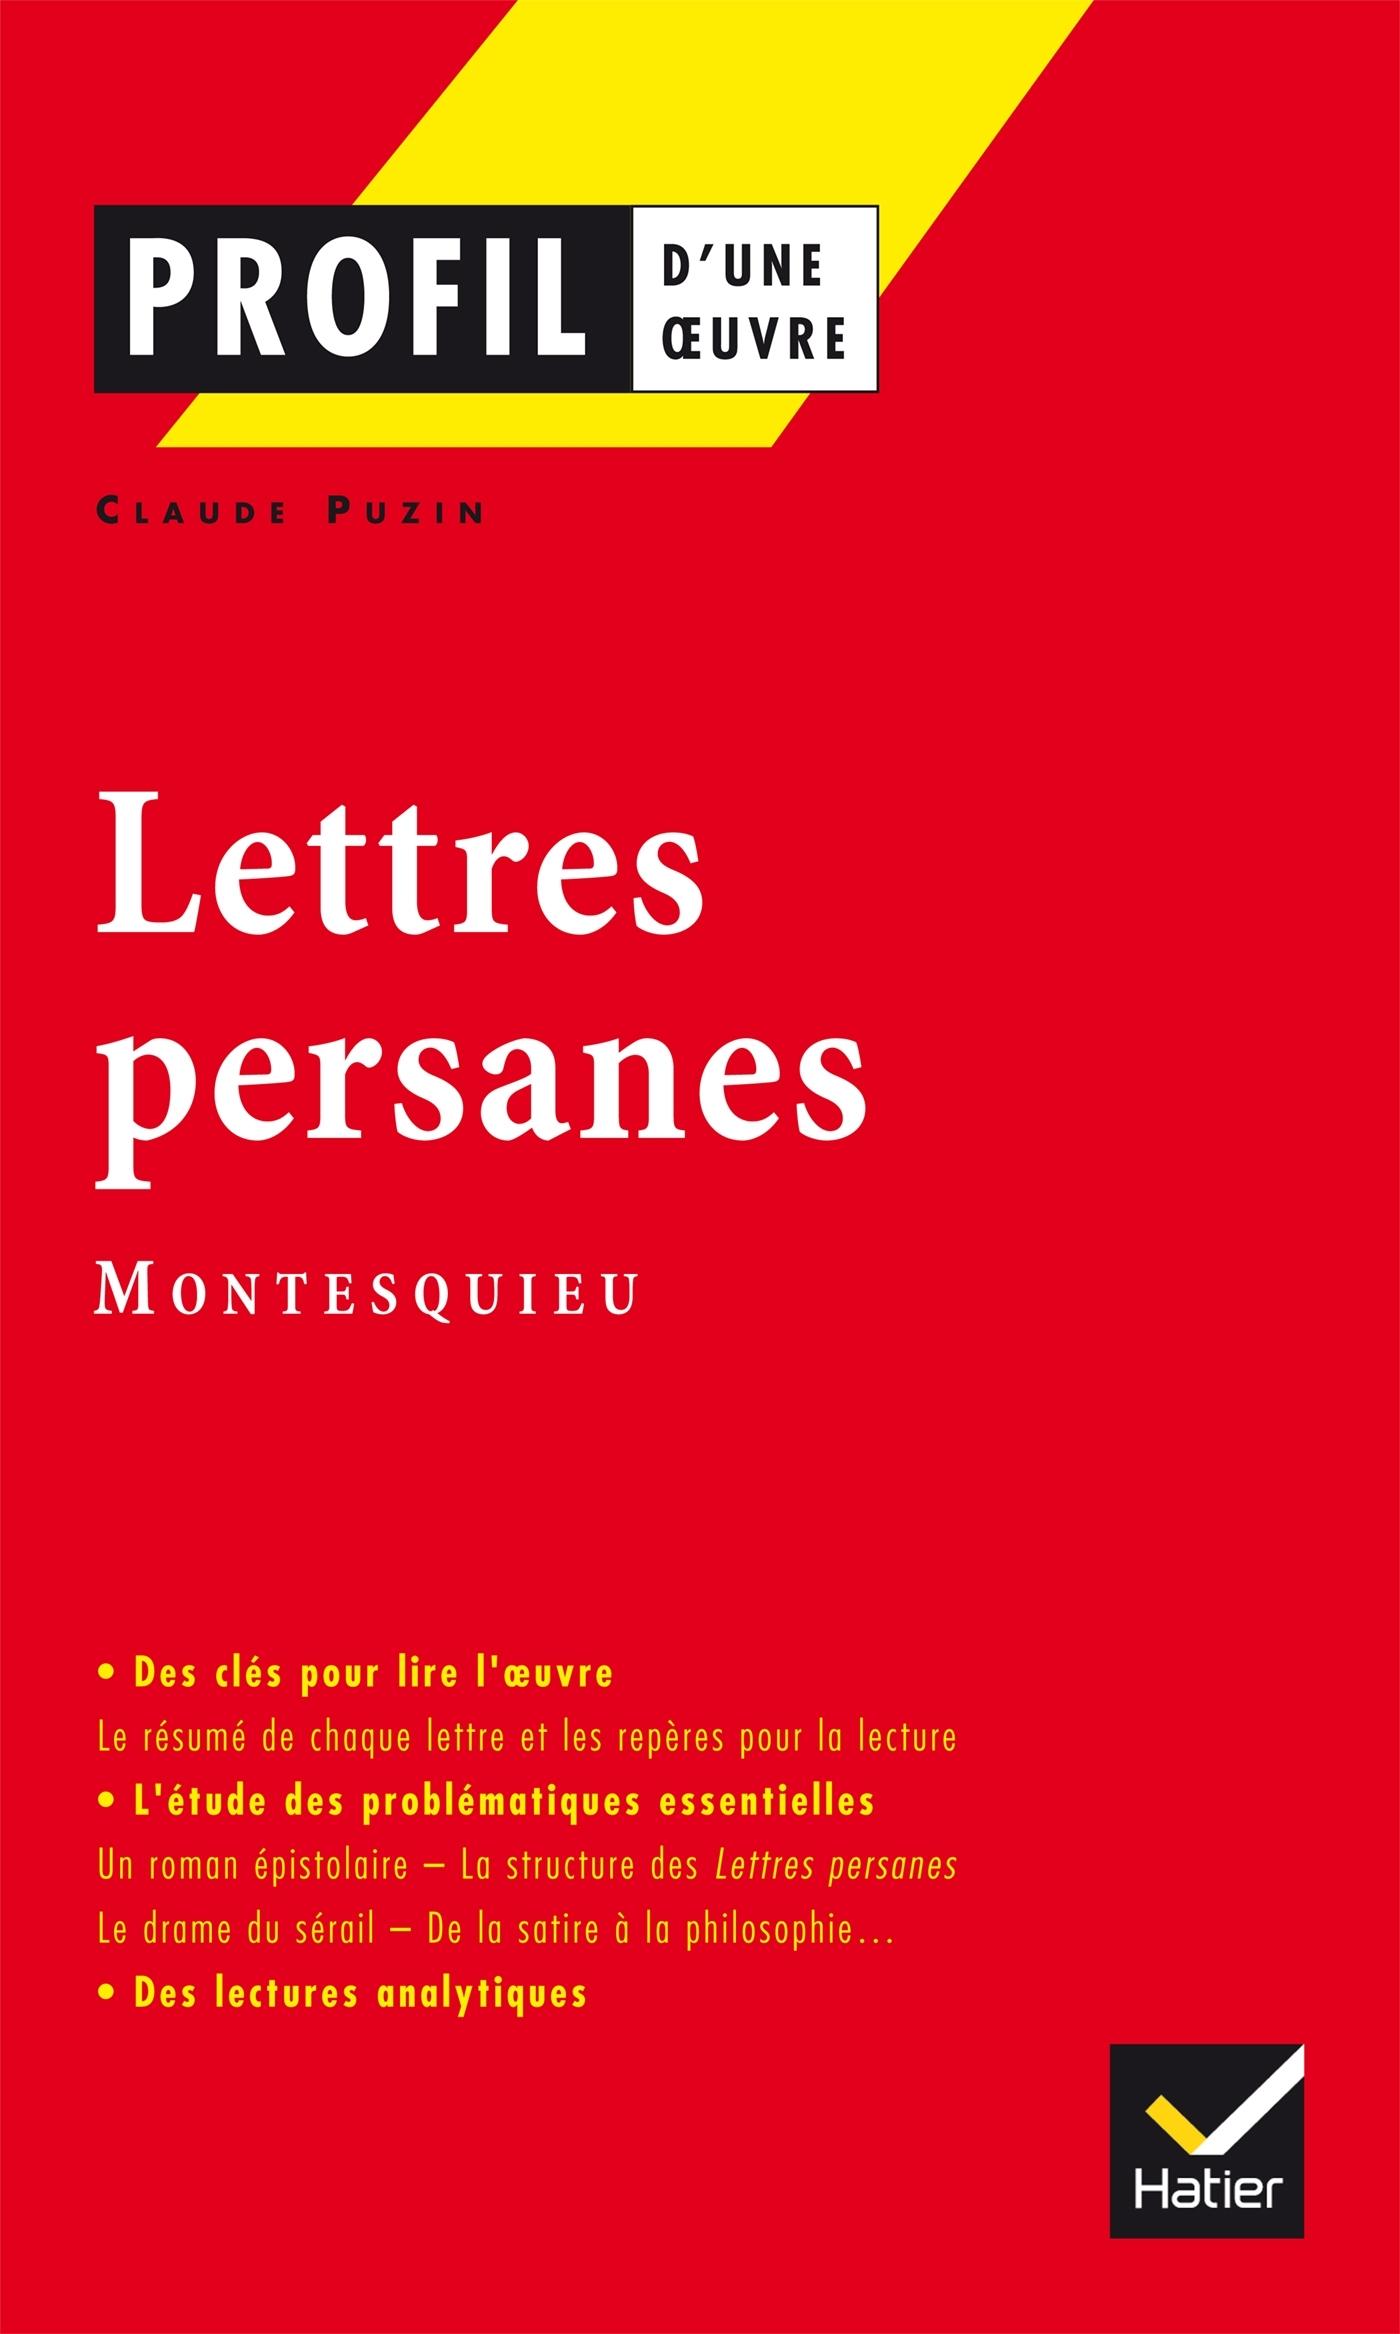 PROFIL - MONTESQUIEU : LETTRES PERSANES